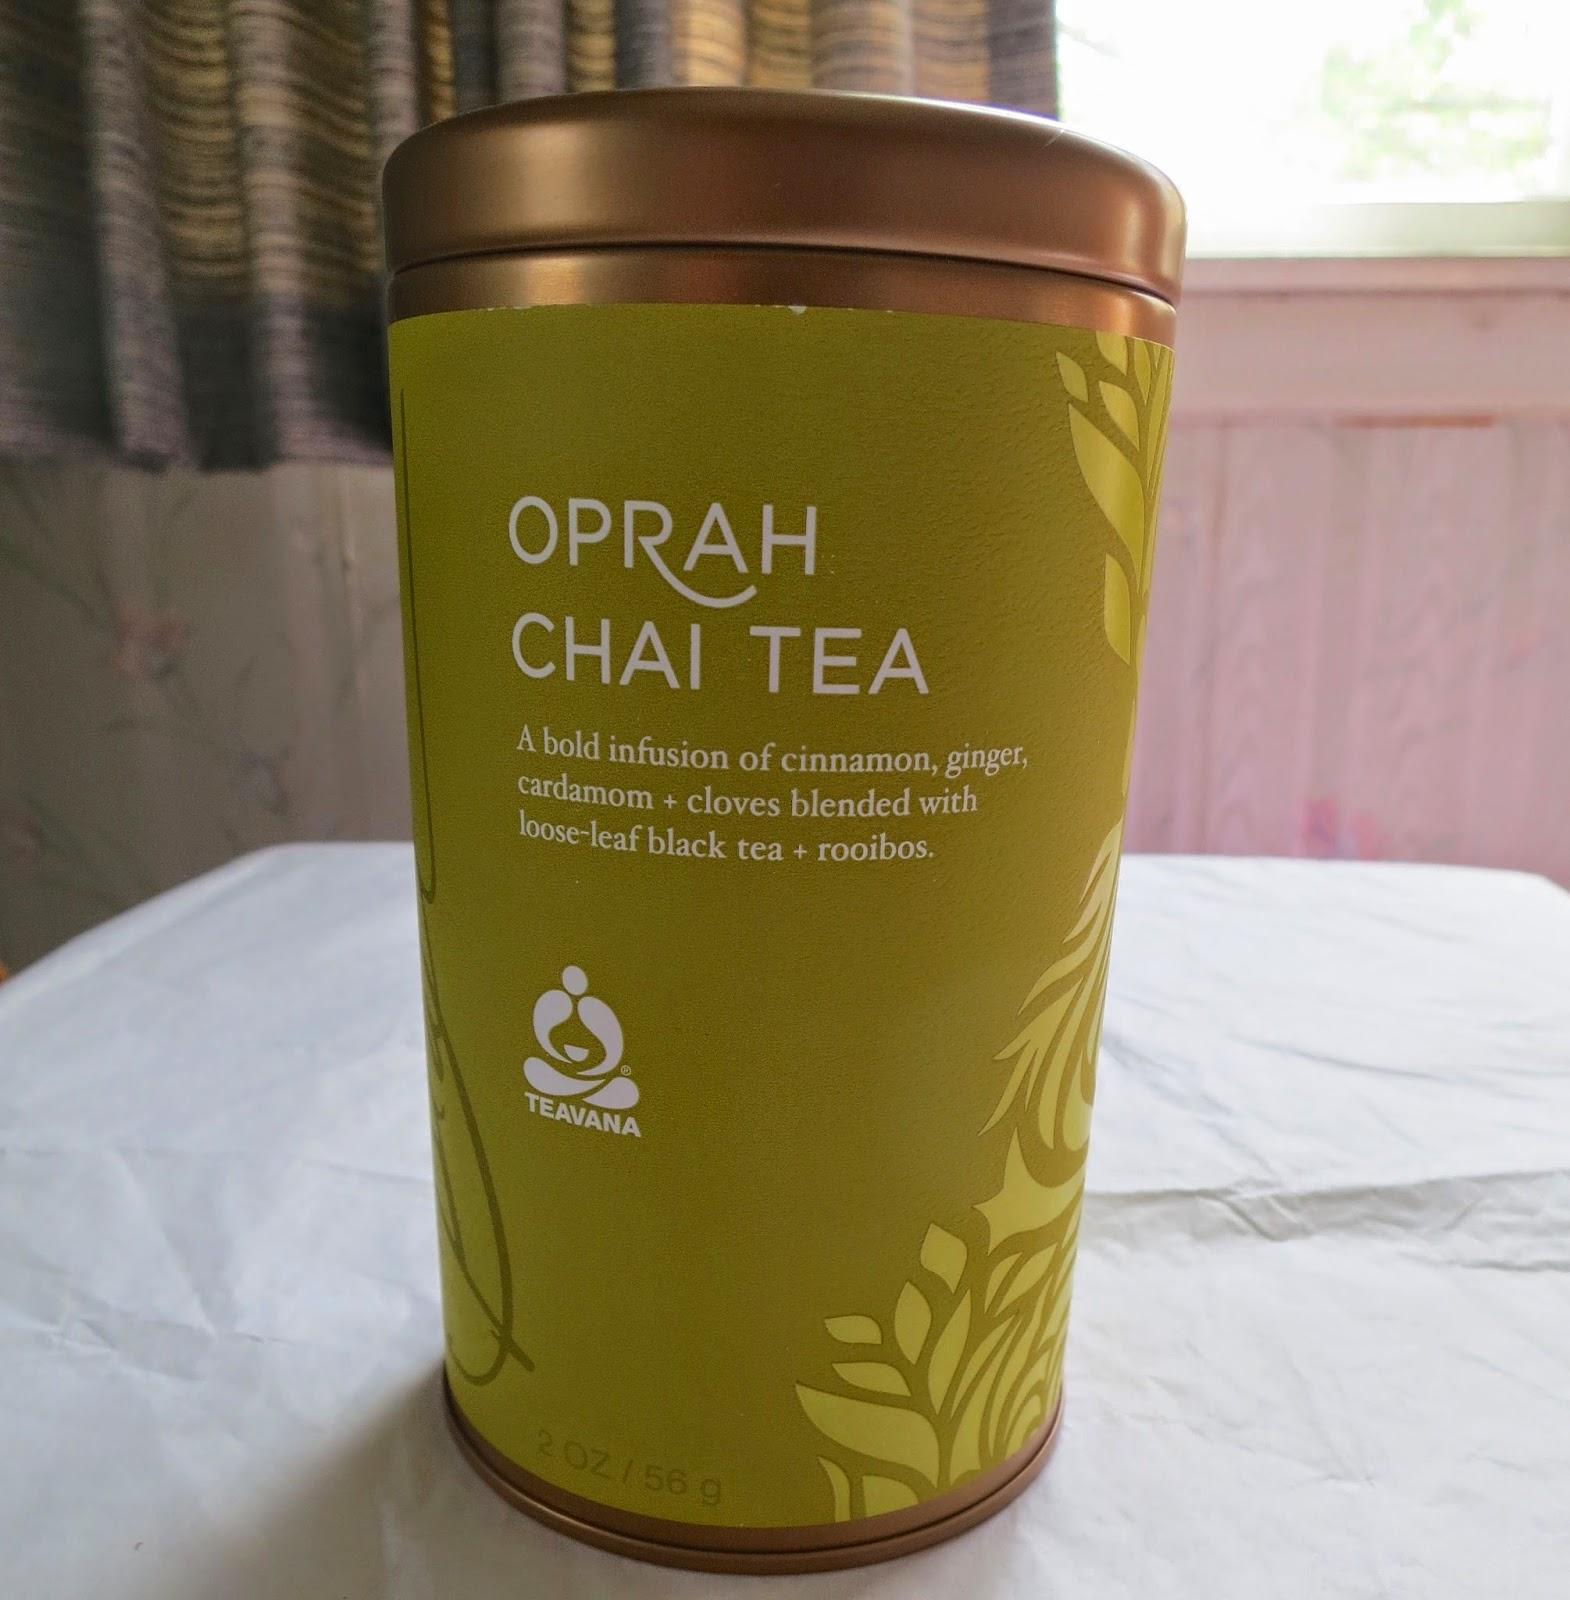 Ask Away Blog: Enjoy Teavana Oprah Chai Tea With Mom